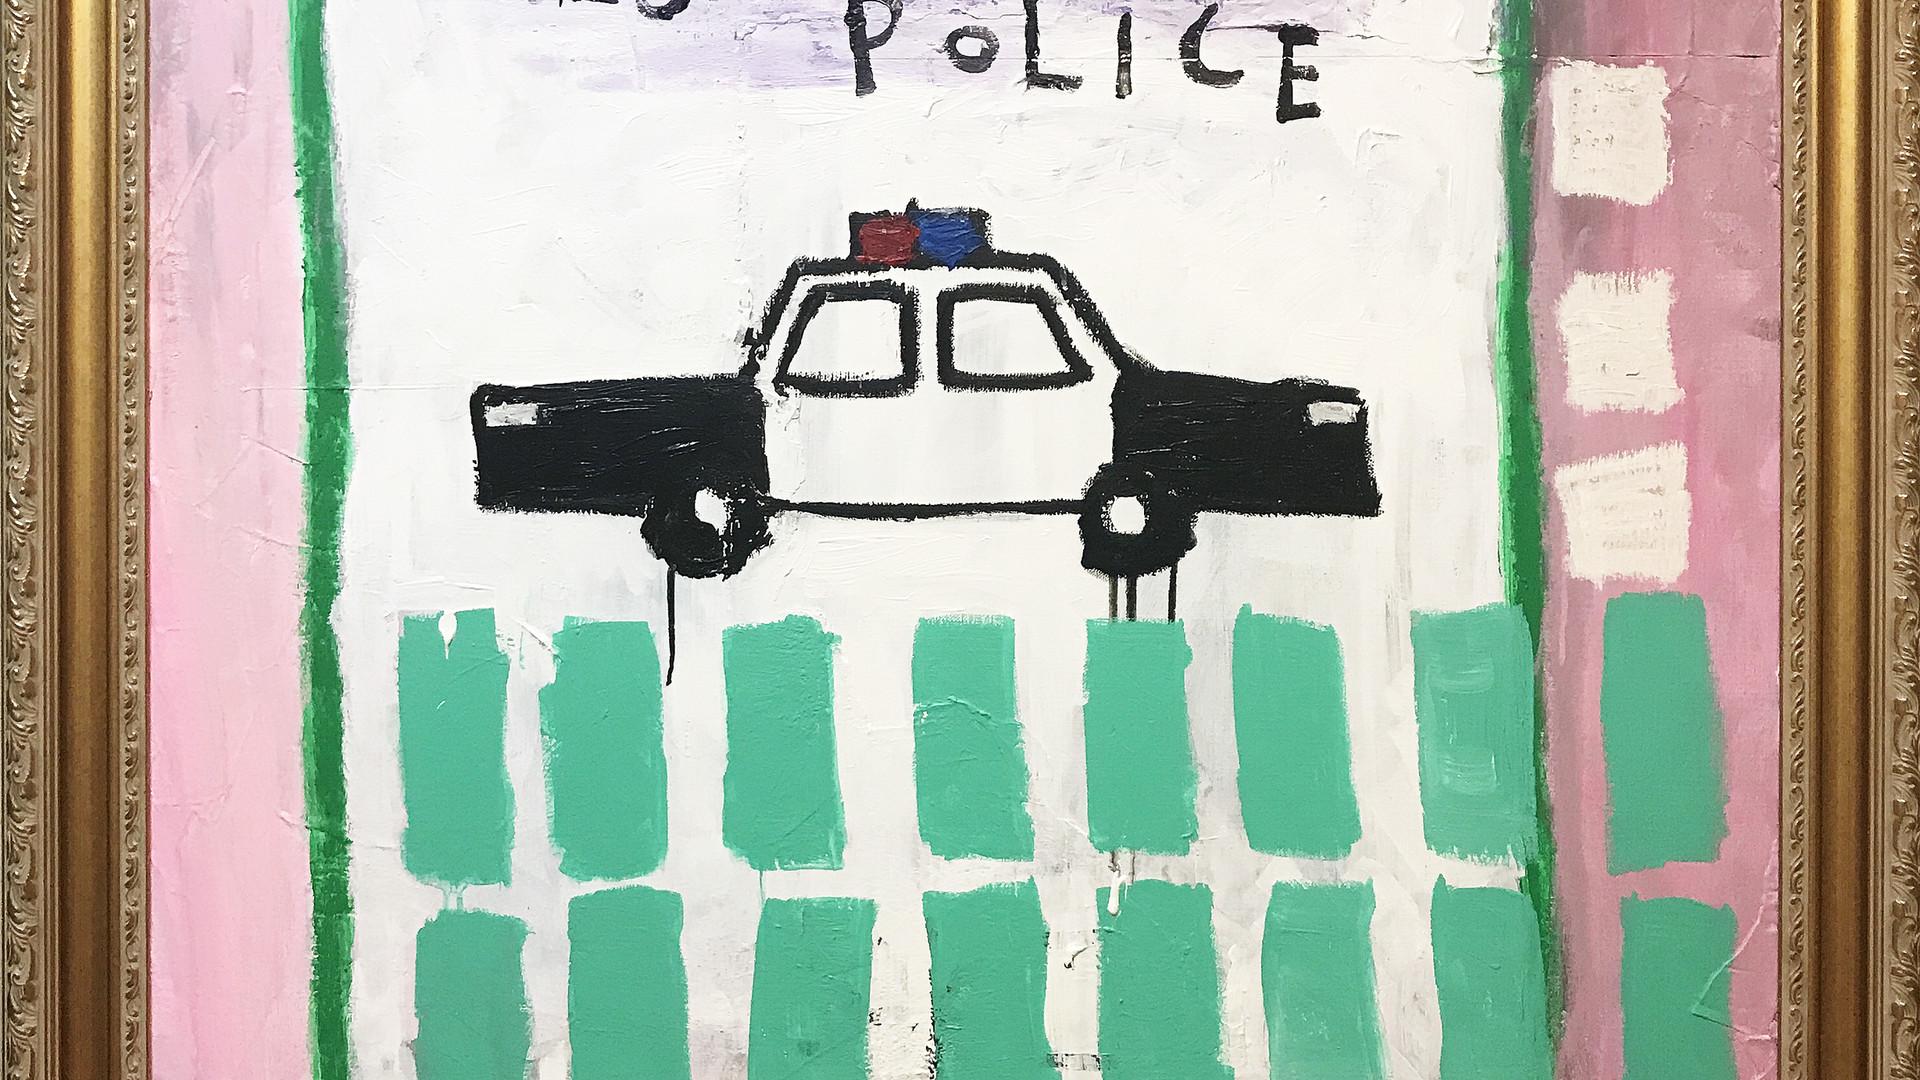 4 Yes Police, 2017, Mixed media on canva